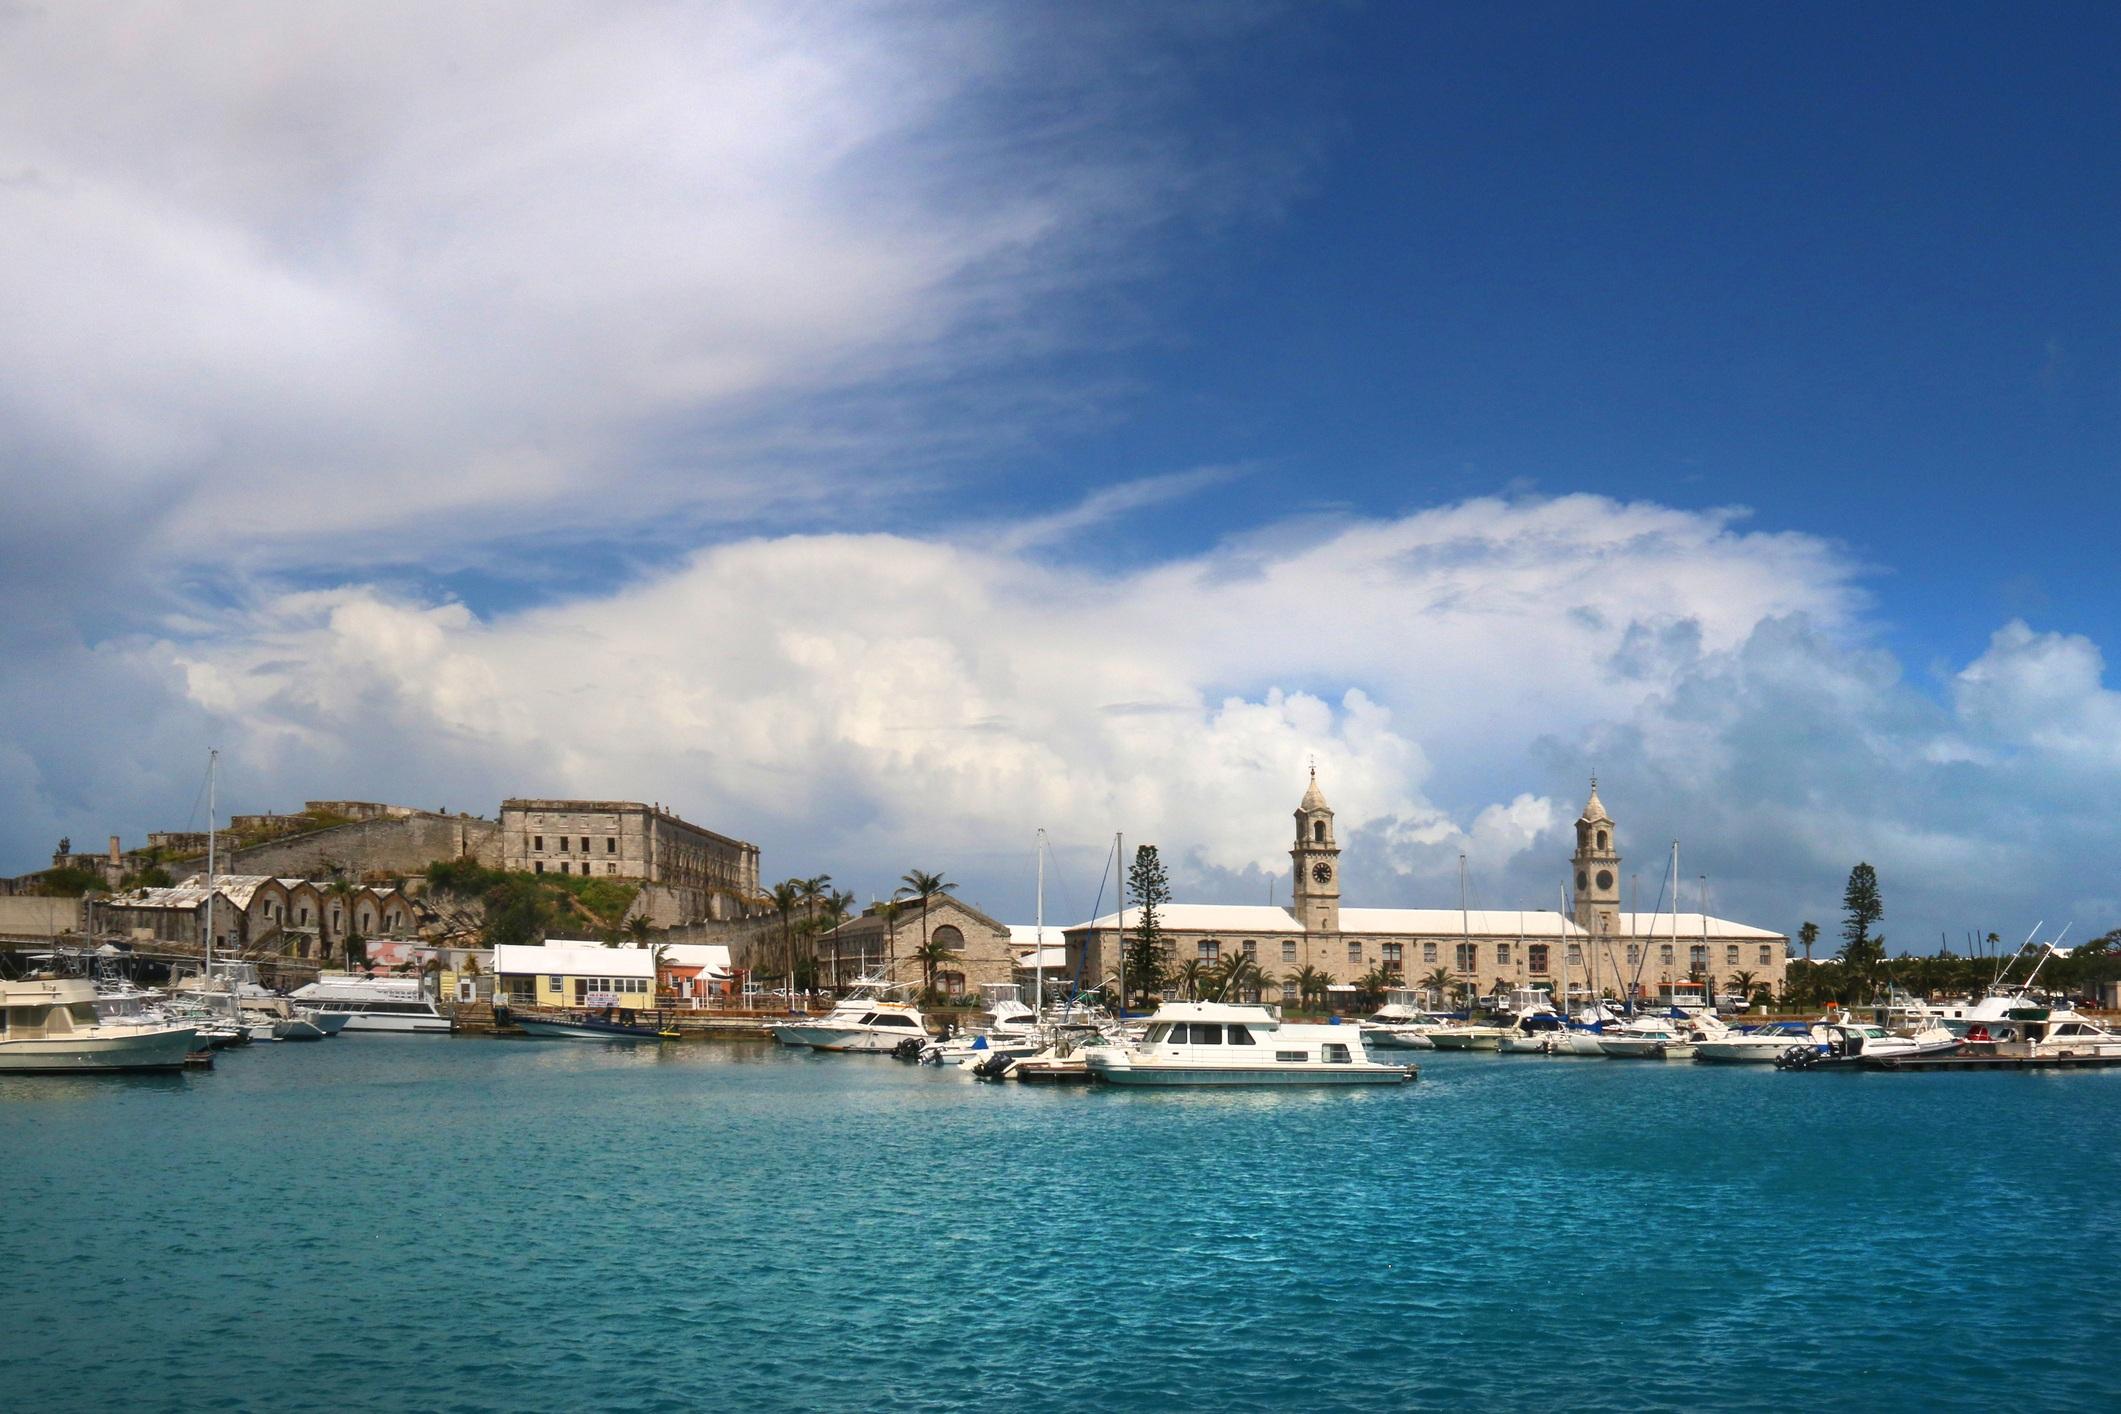 King's Wharf Bermuda